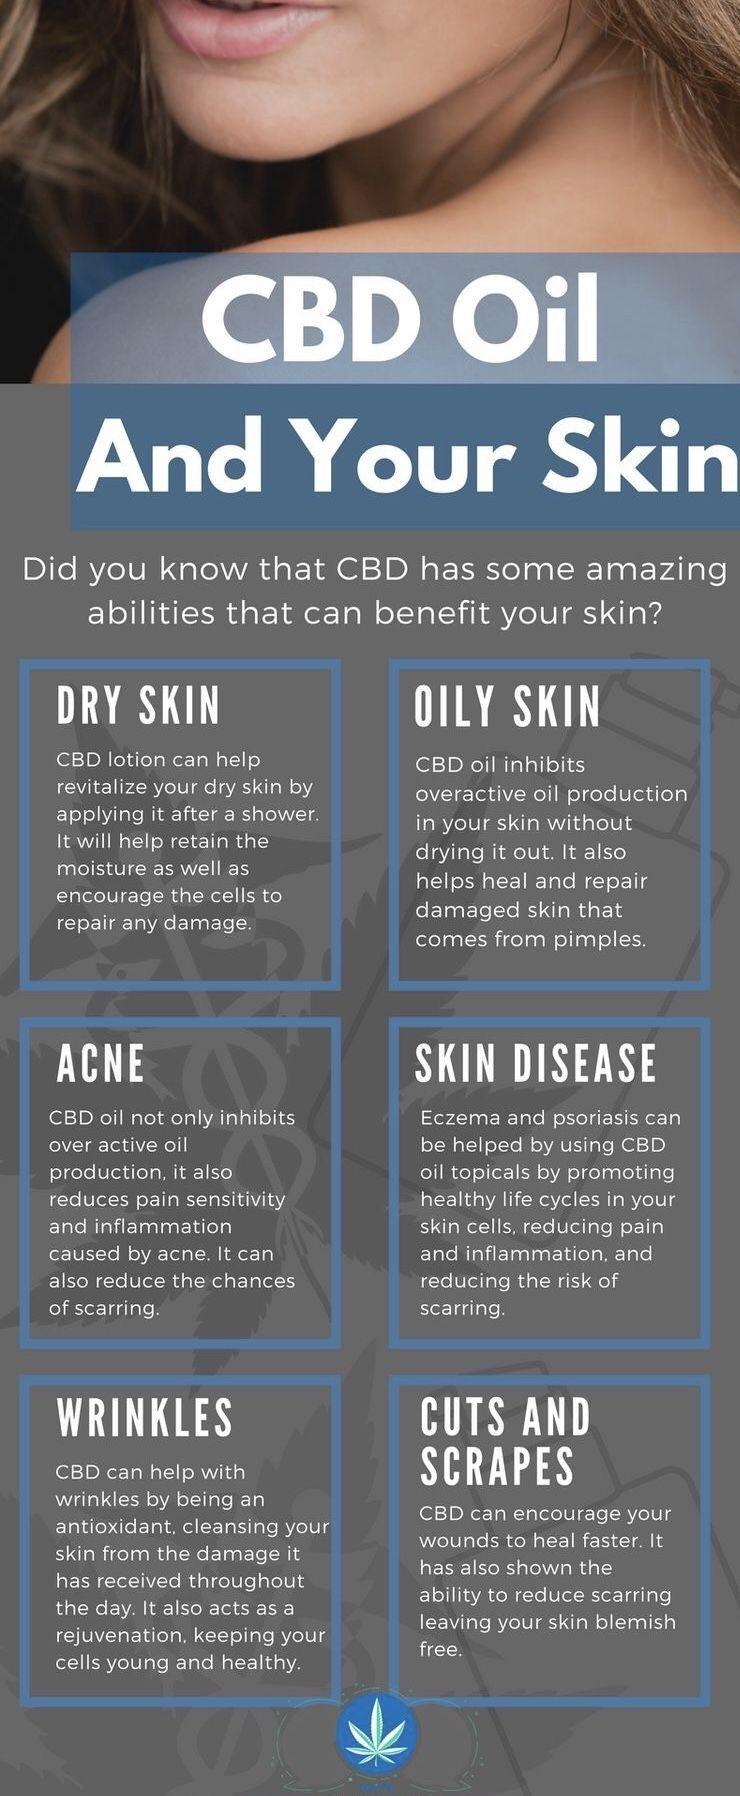 CBD's amazing benefits for your skin. Skincare